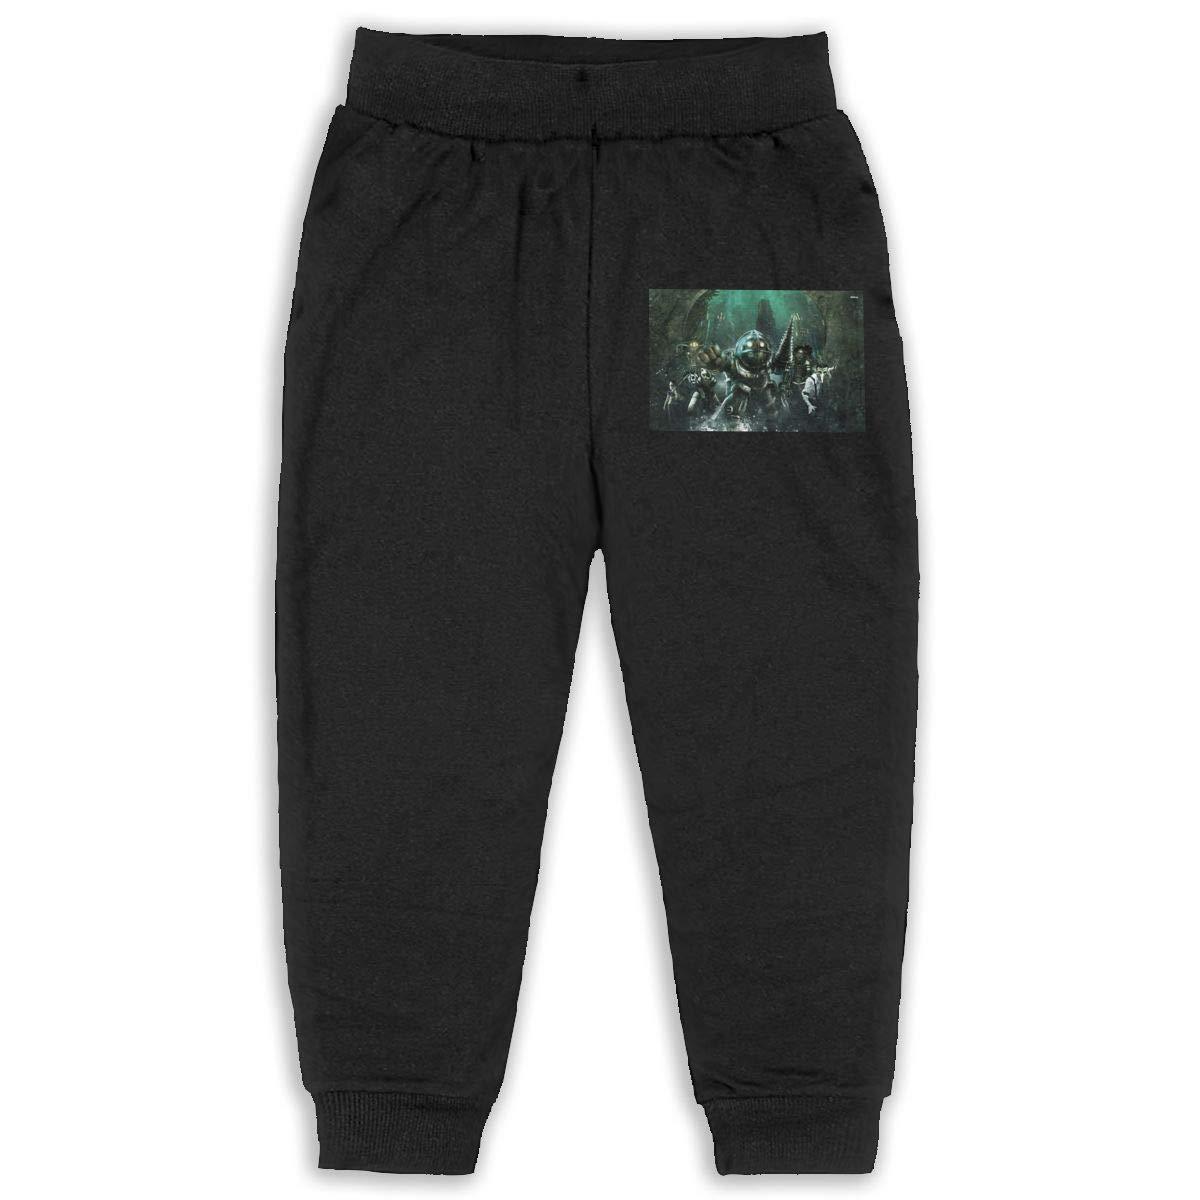 Pleasantly Bioshock Wallpaper Long Pants Sweatpants for Unisex Childrens Casual Trousers Black